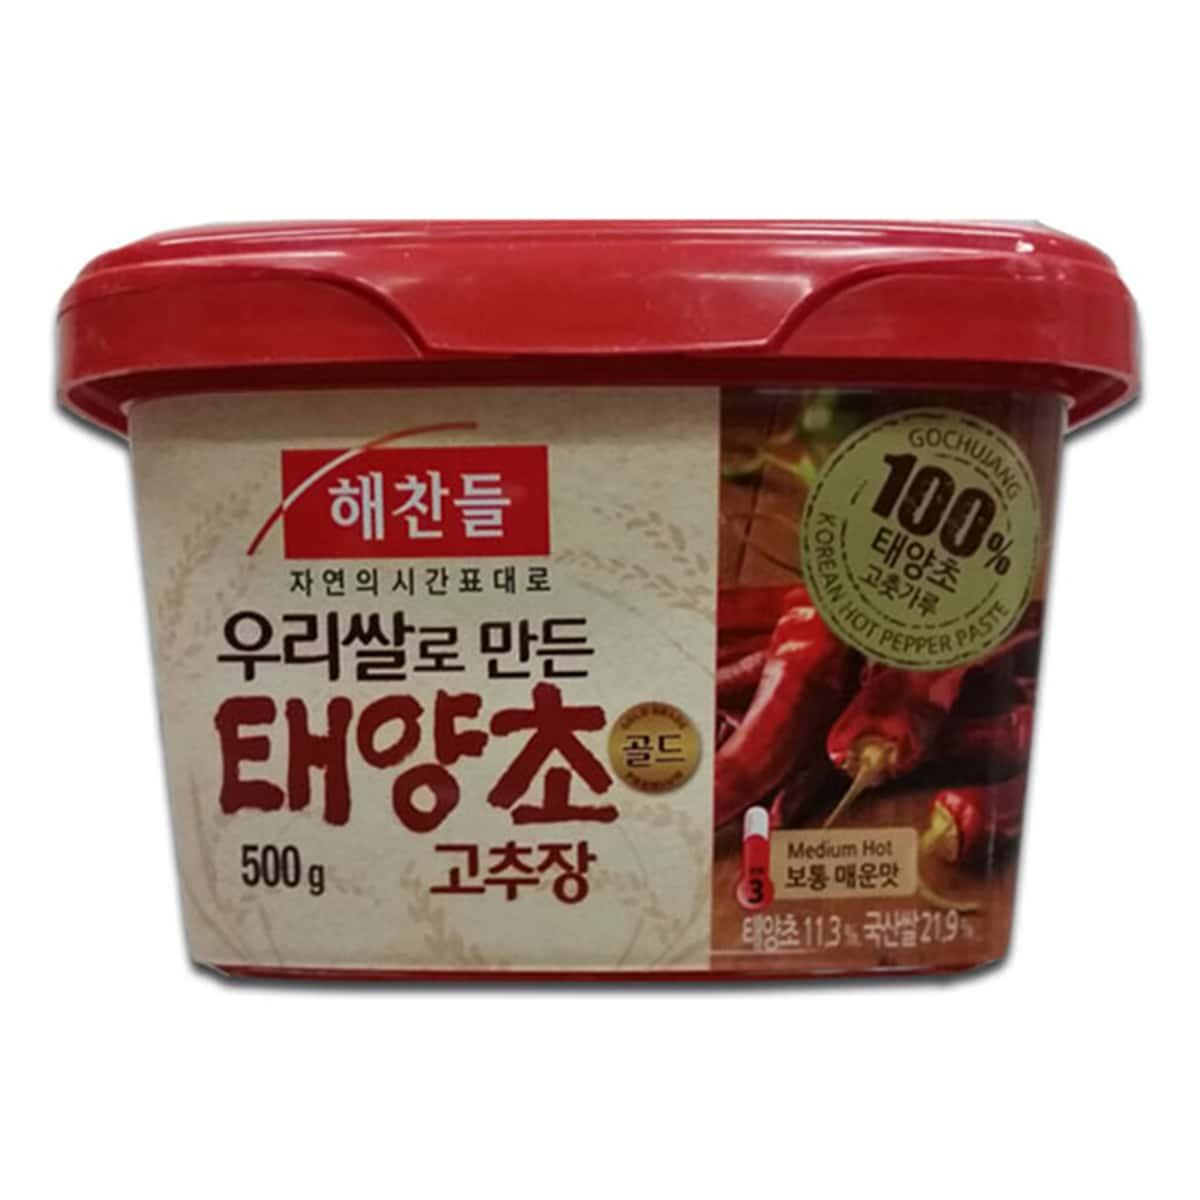 Buy CJ Haechandle Gochujang (Korean Hot Pepper Paste) Medium Hot - 500 gm